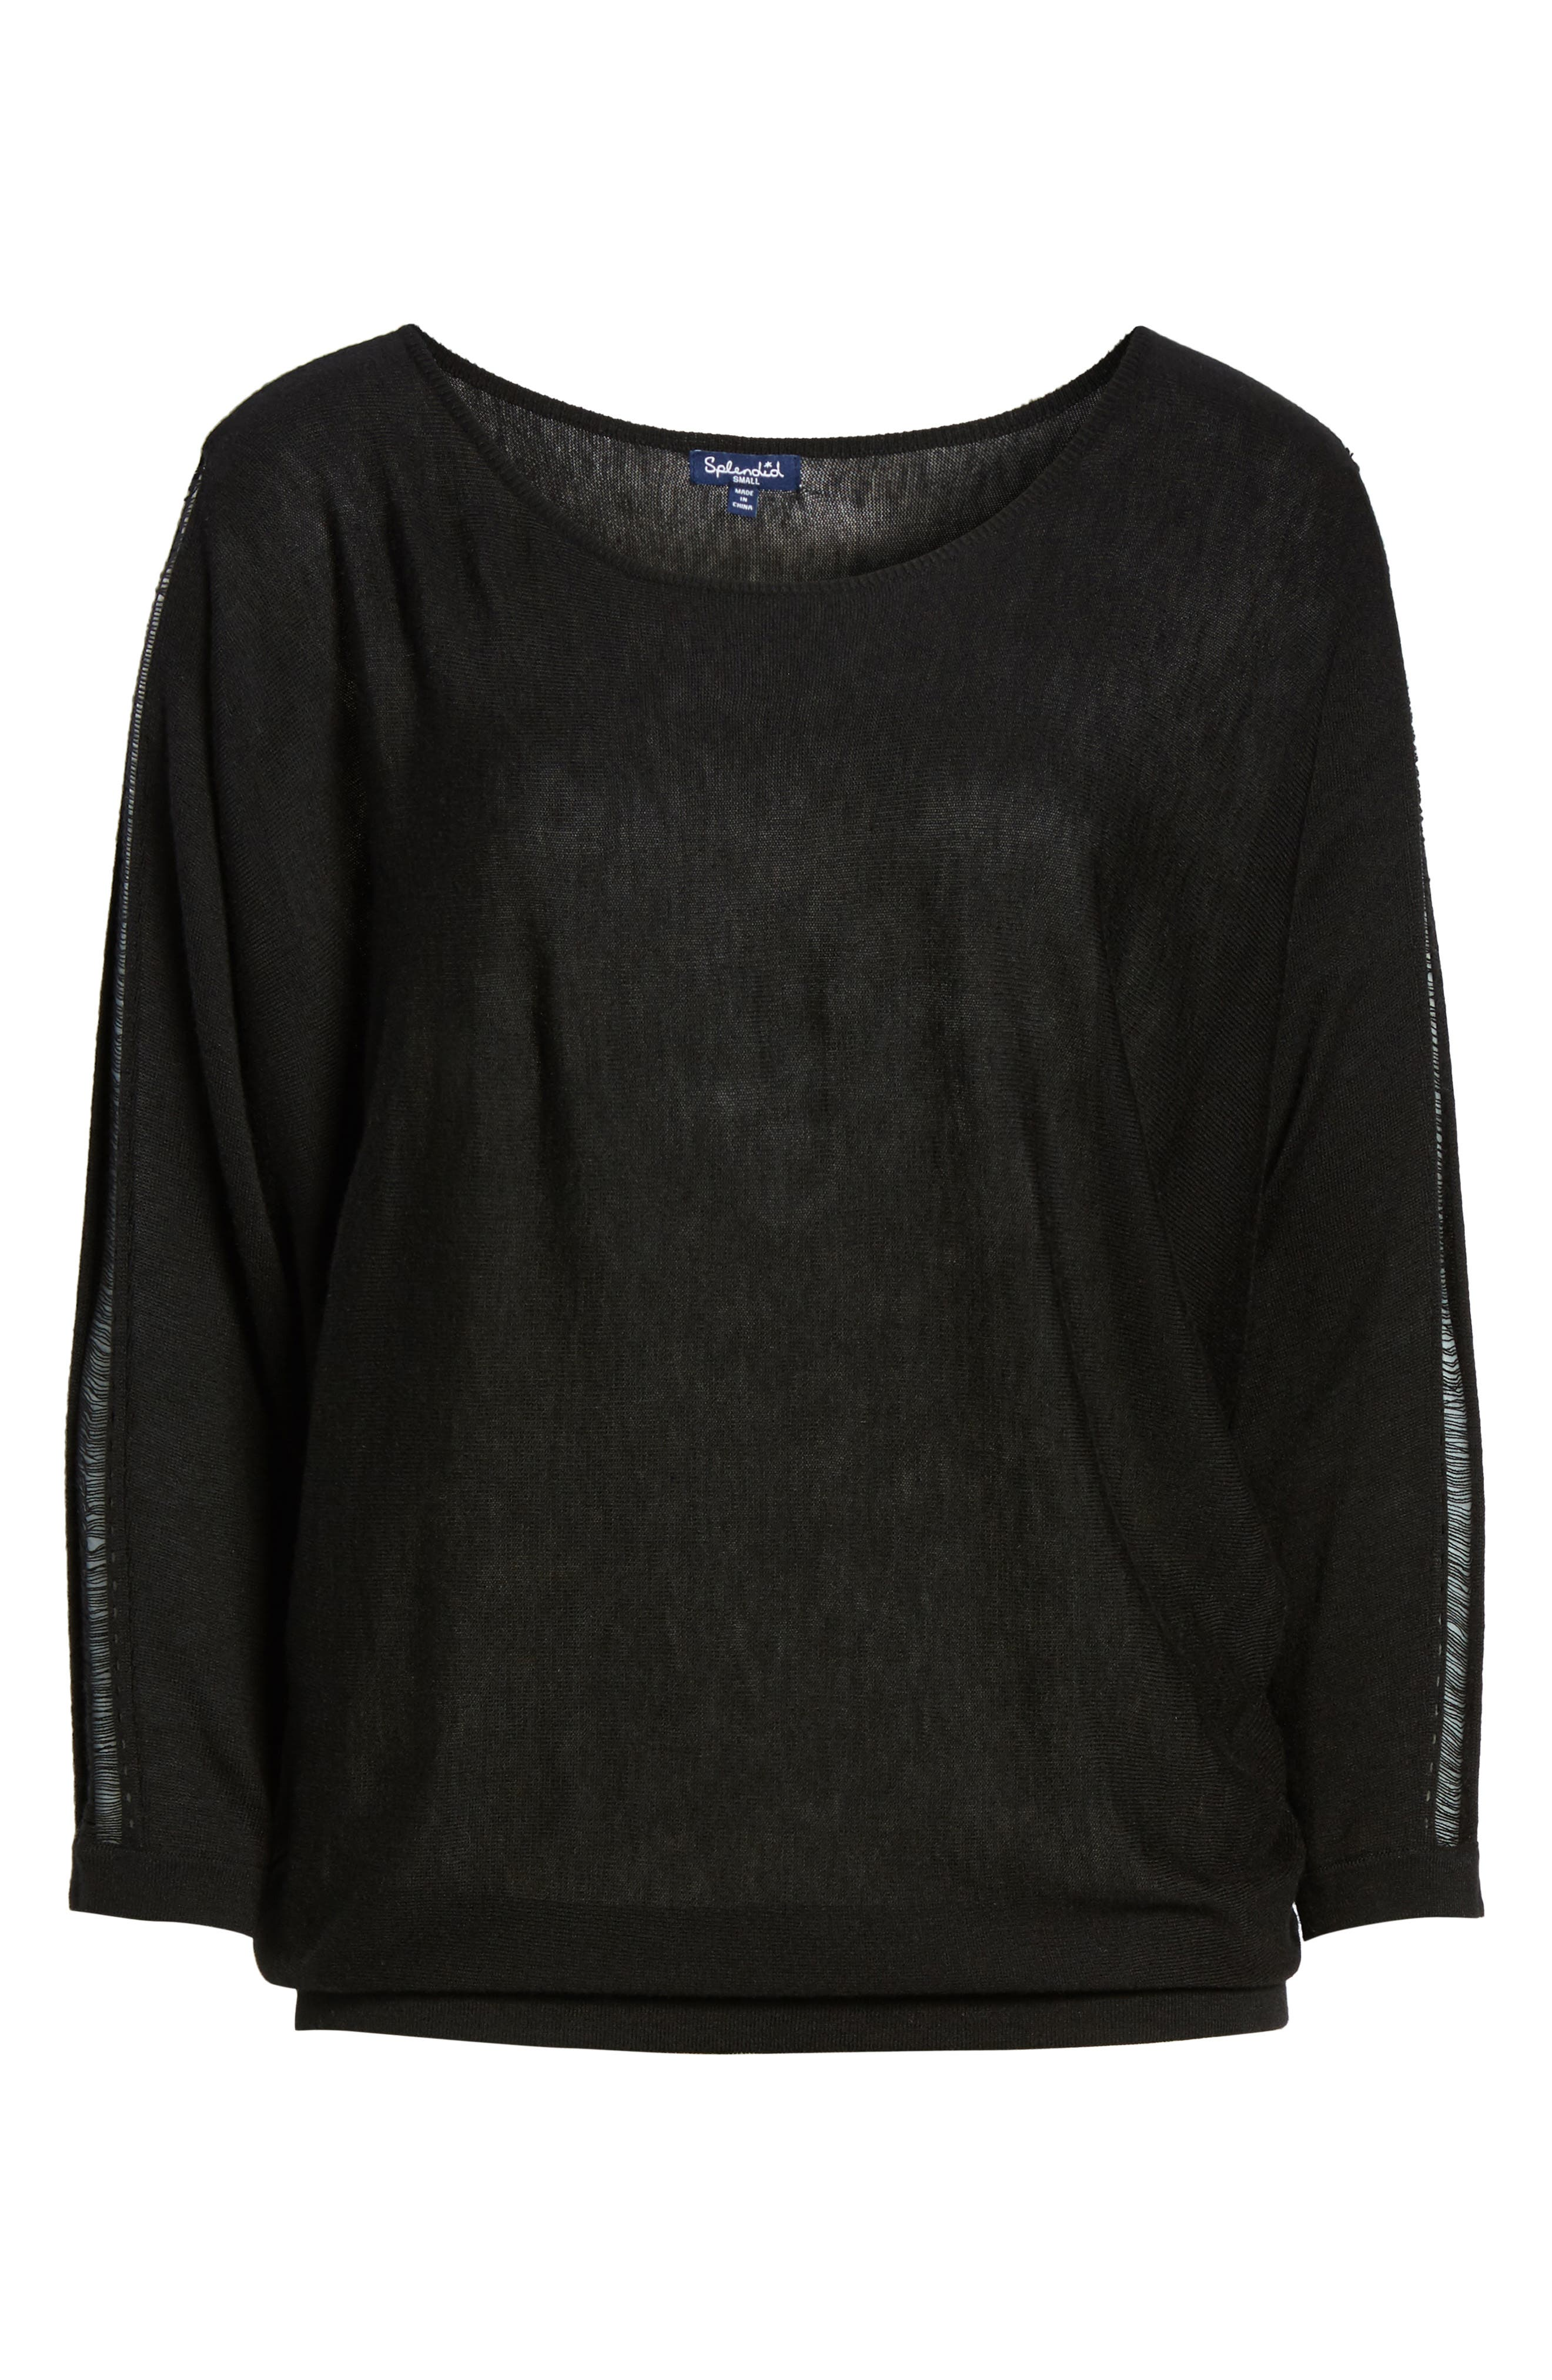 Whitlock Sweater,                             Alternate thumbnail 6, color,                             Black